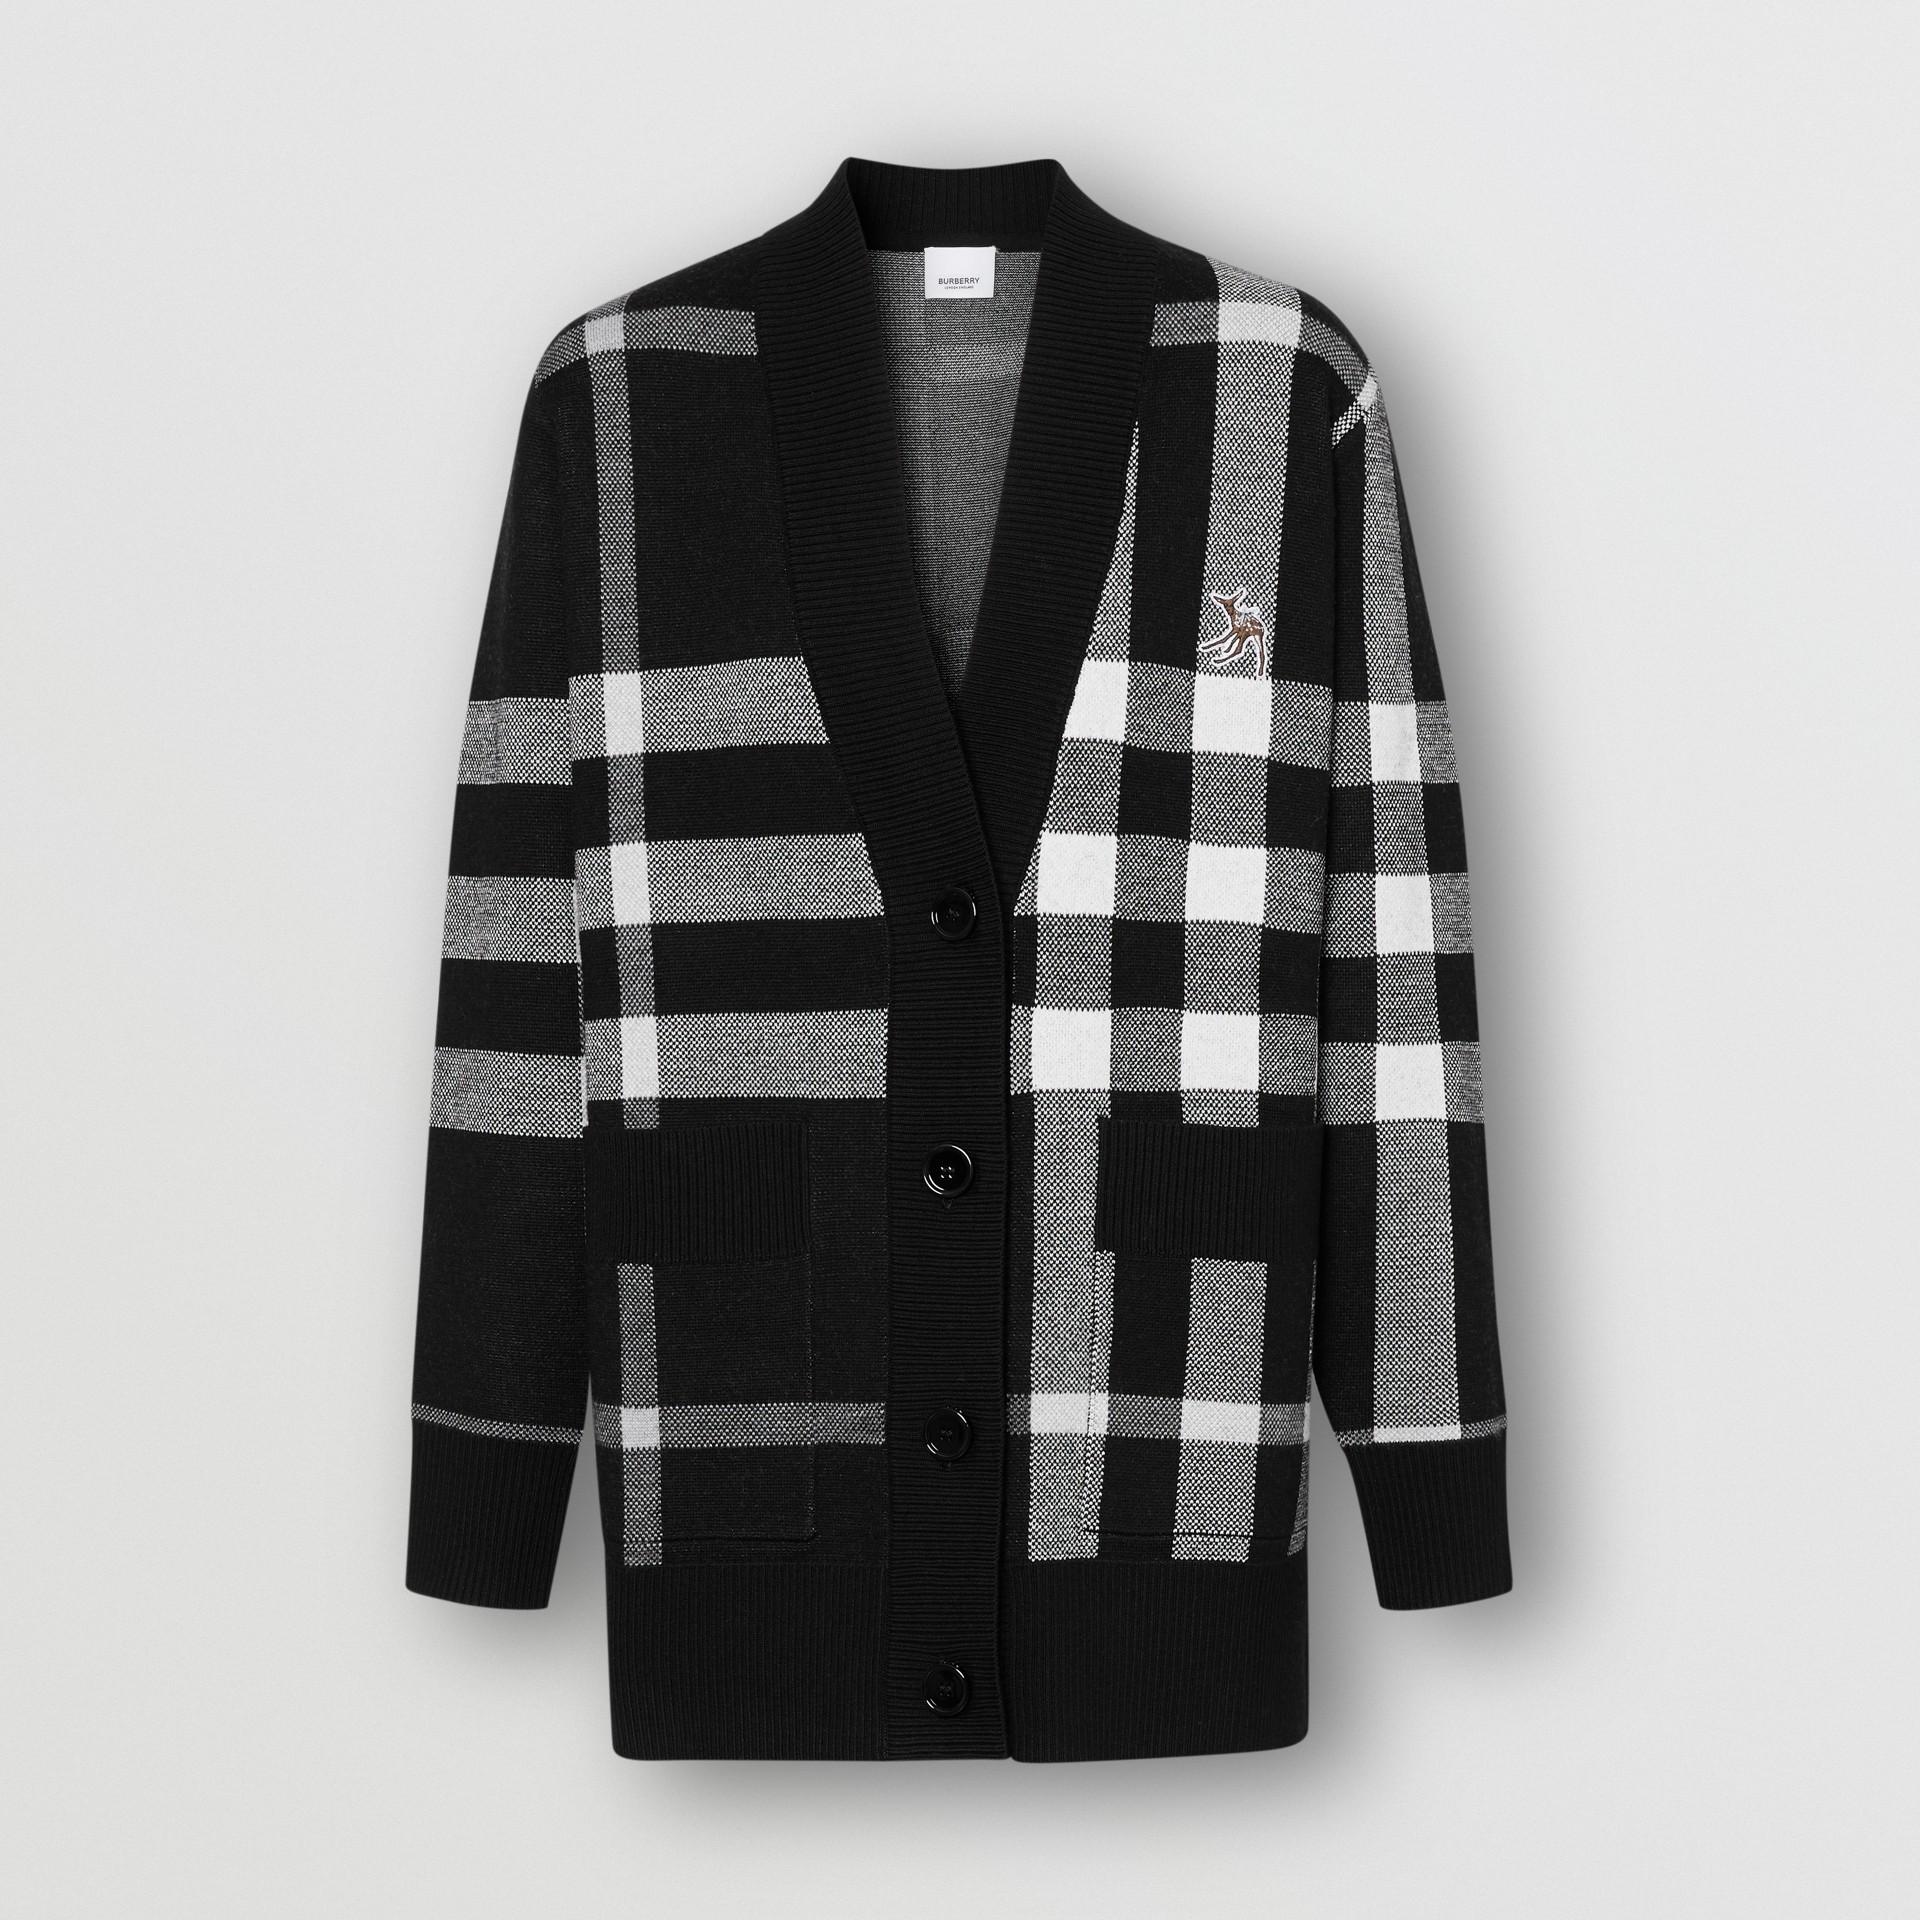 Deer Motif Check Wool Blend Jacquard Cardigan in Black - Women | Burberry - gallery image 1